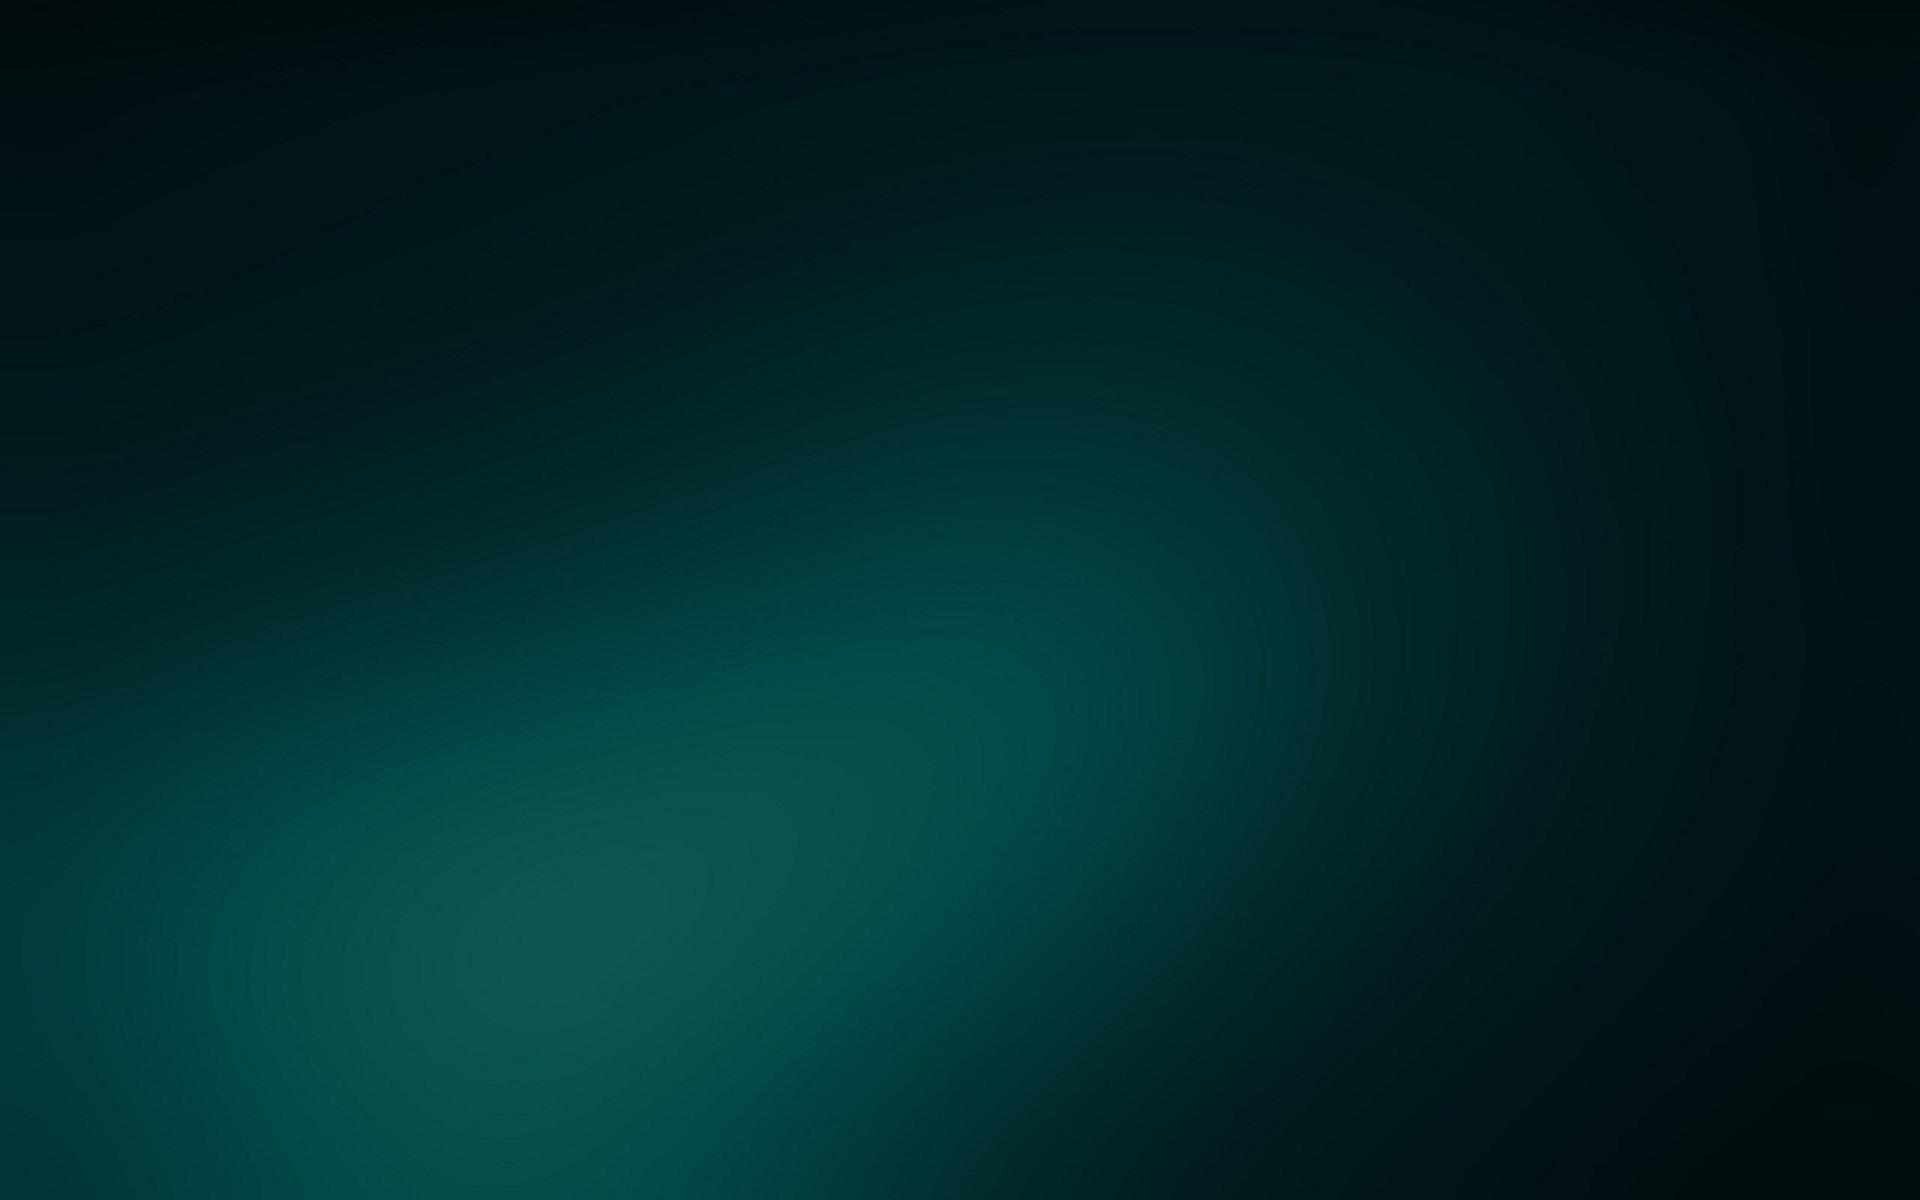 Dark Green Wallpaper HD (59+ images)